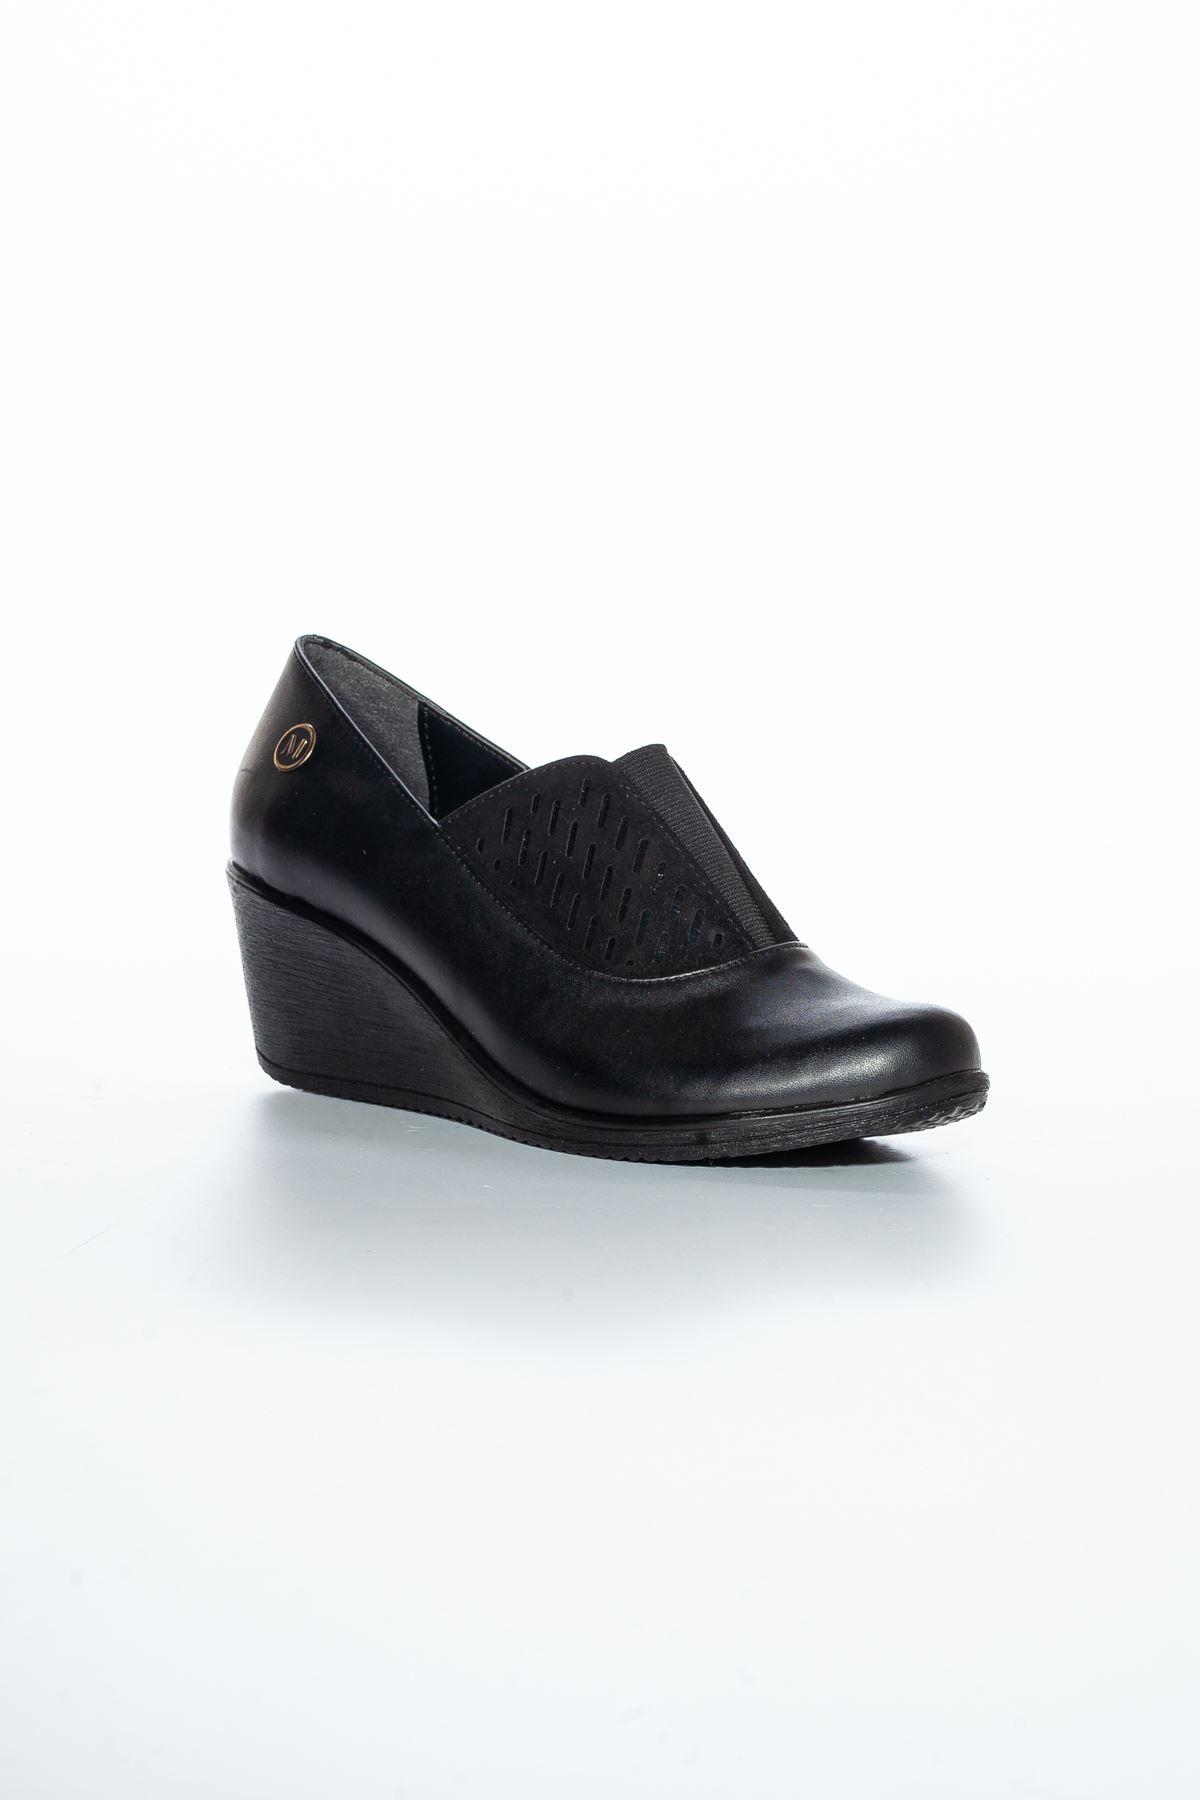 Alda Cilt Ayakkabı Siyah